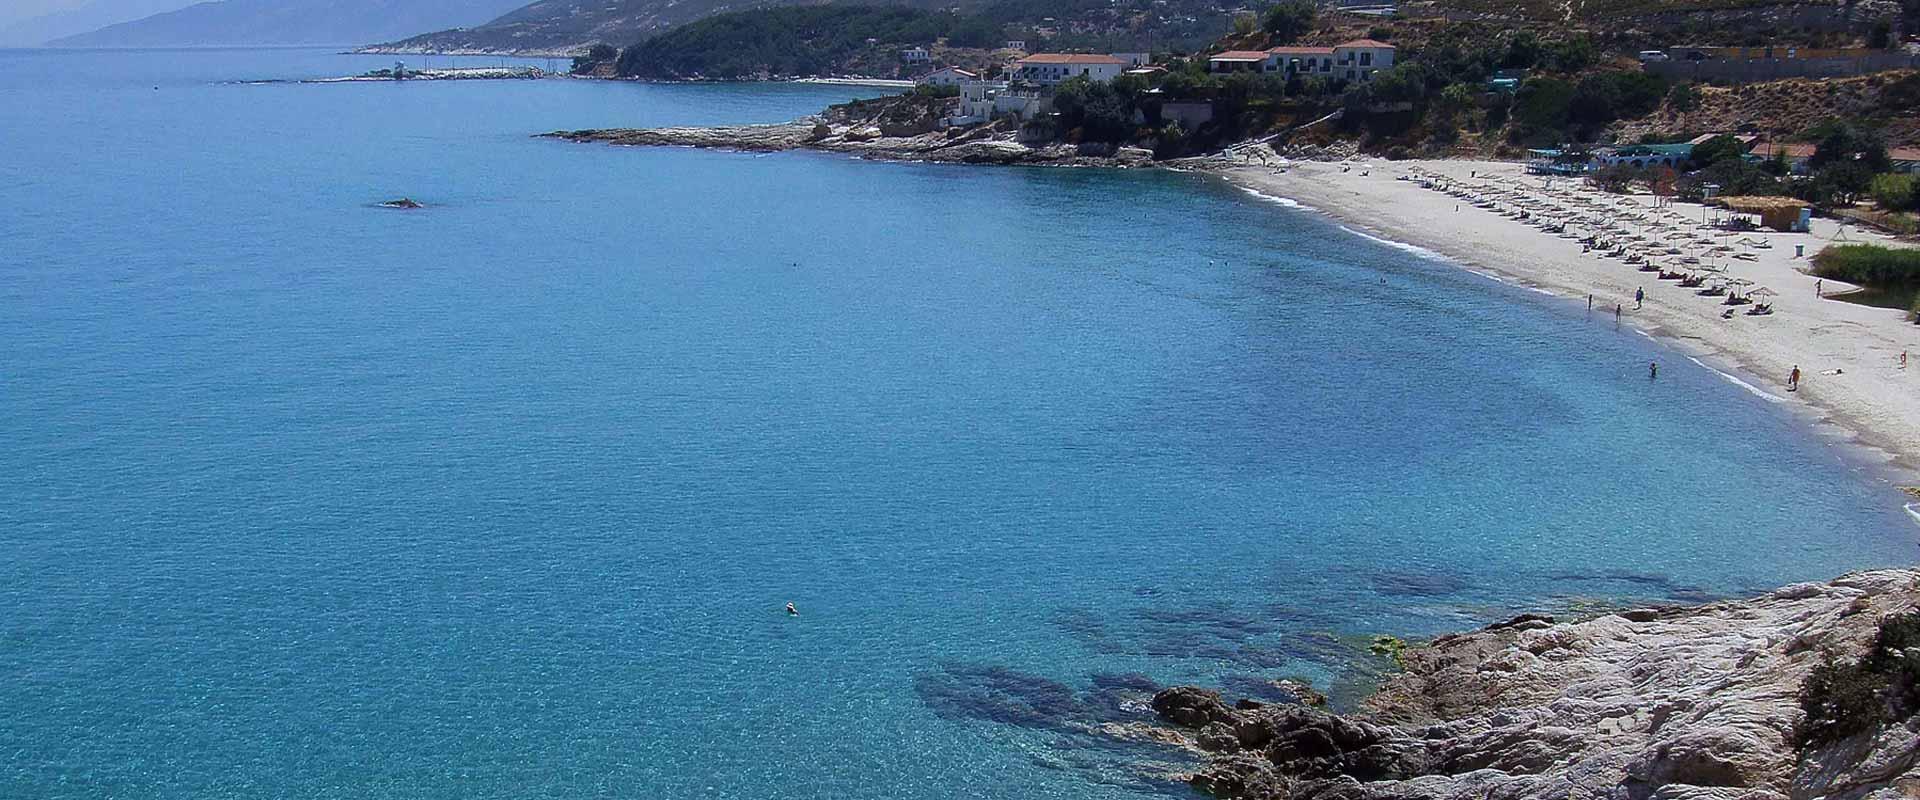 ikaria olivia villas livadi beach view photo